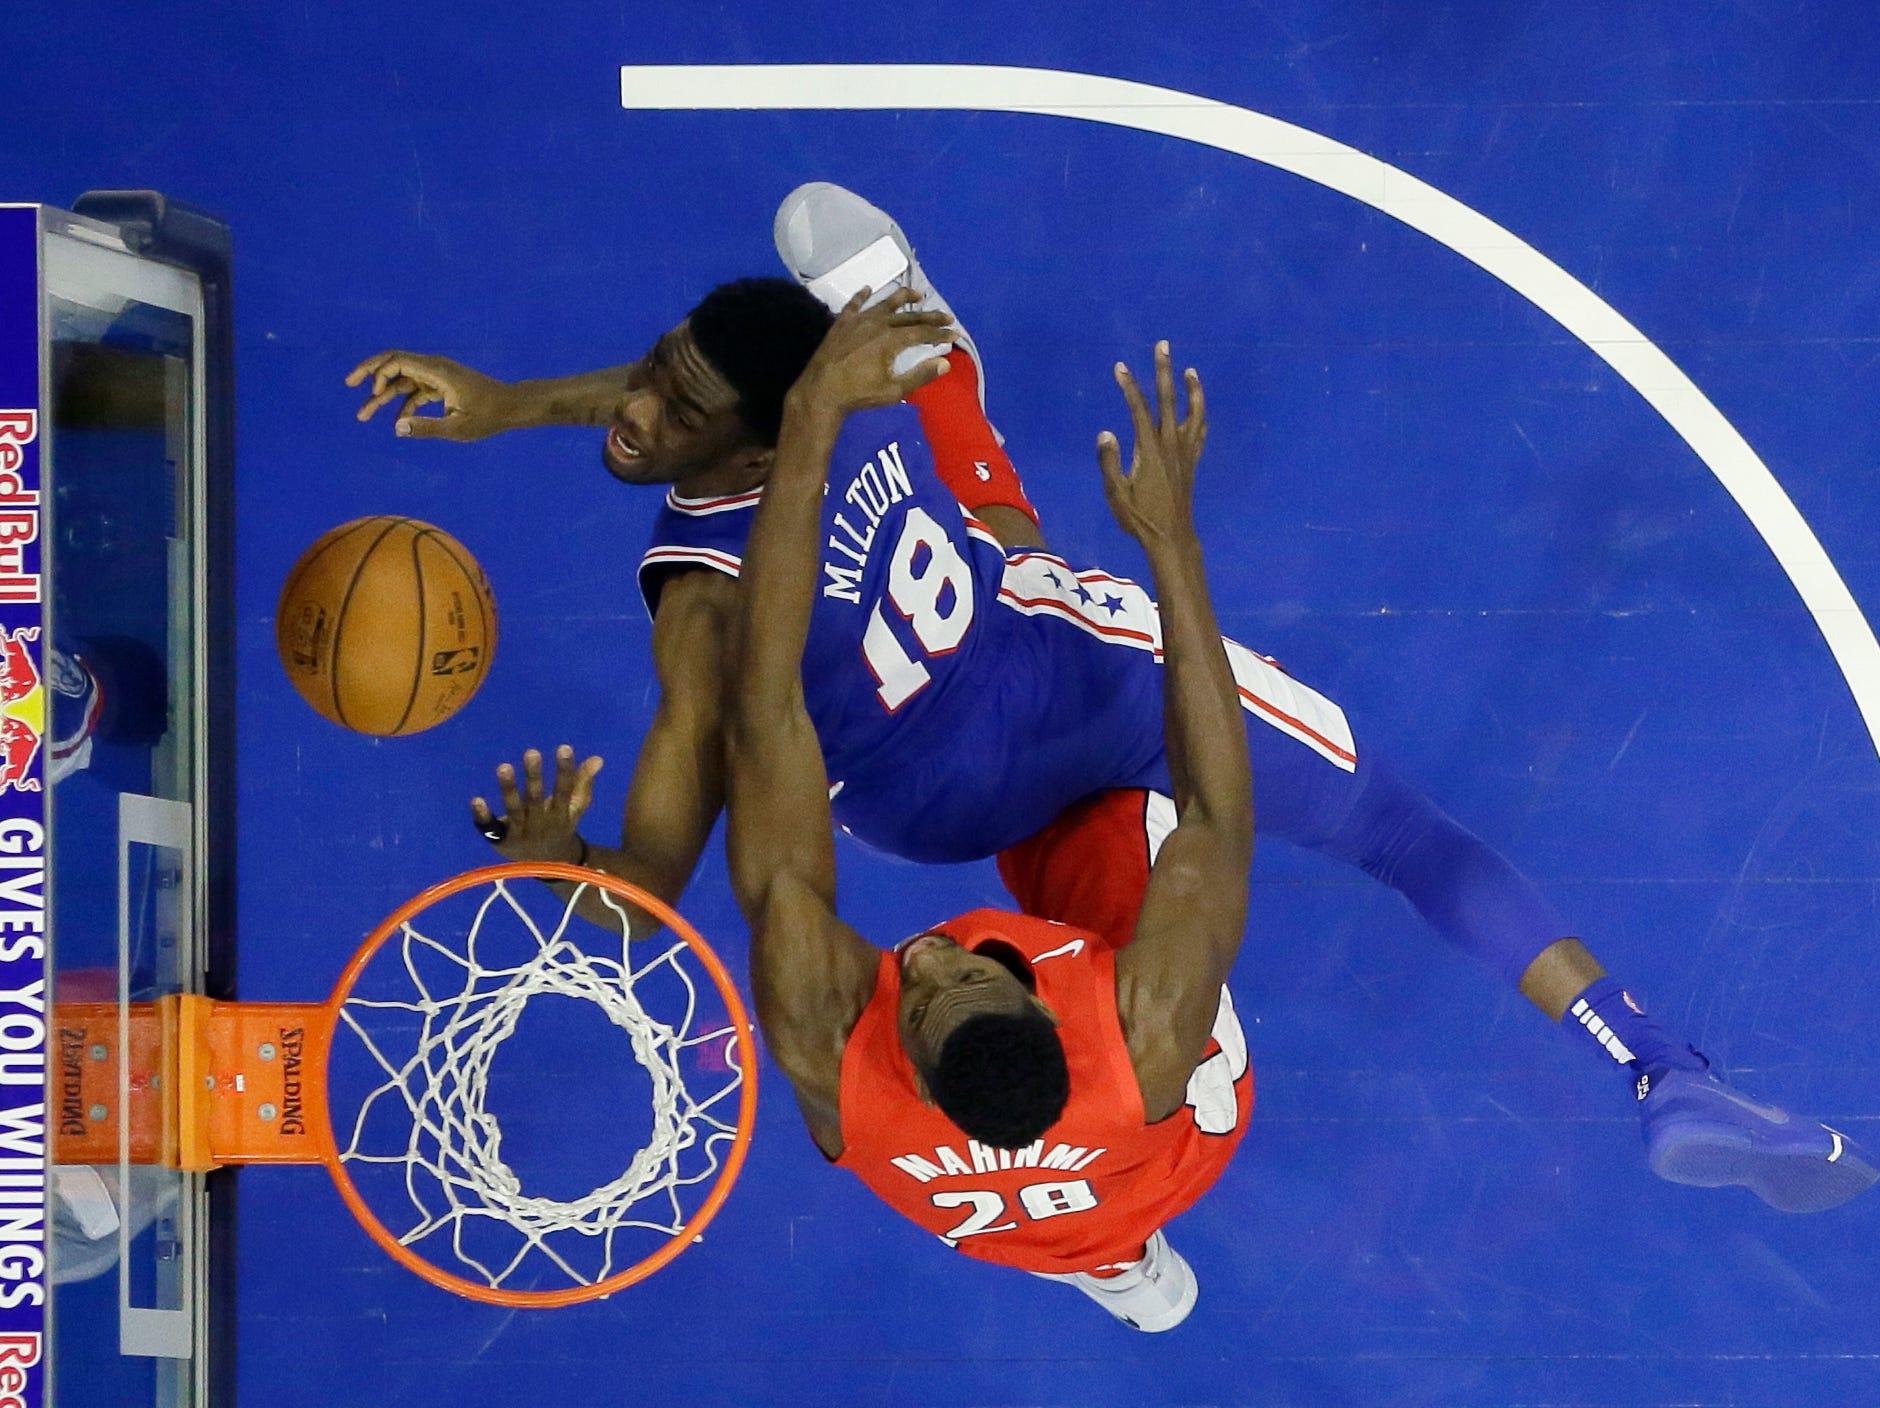 Philadelphia 76ers' Shake Milton (18) tries to get a shot past Washington Wizards' Ian Mahinmi (28) during the first half of an NBA basketball game, Tuesday, Jan. 8, 2019, in Philadelphia. (AP Photo/Matt Slocum)